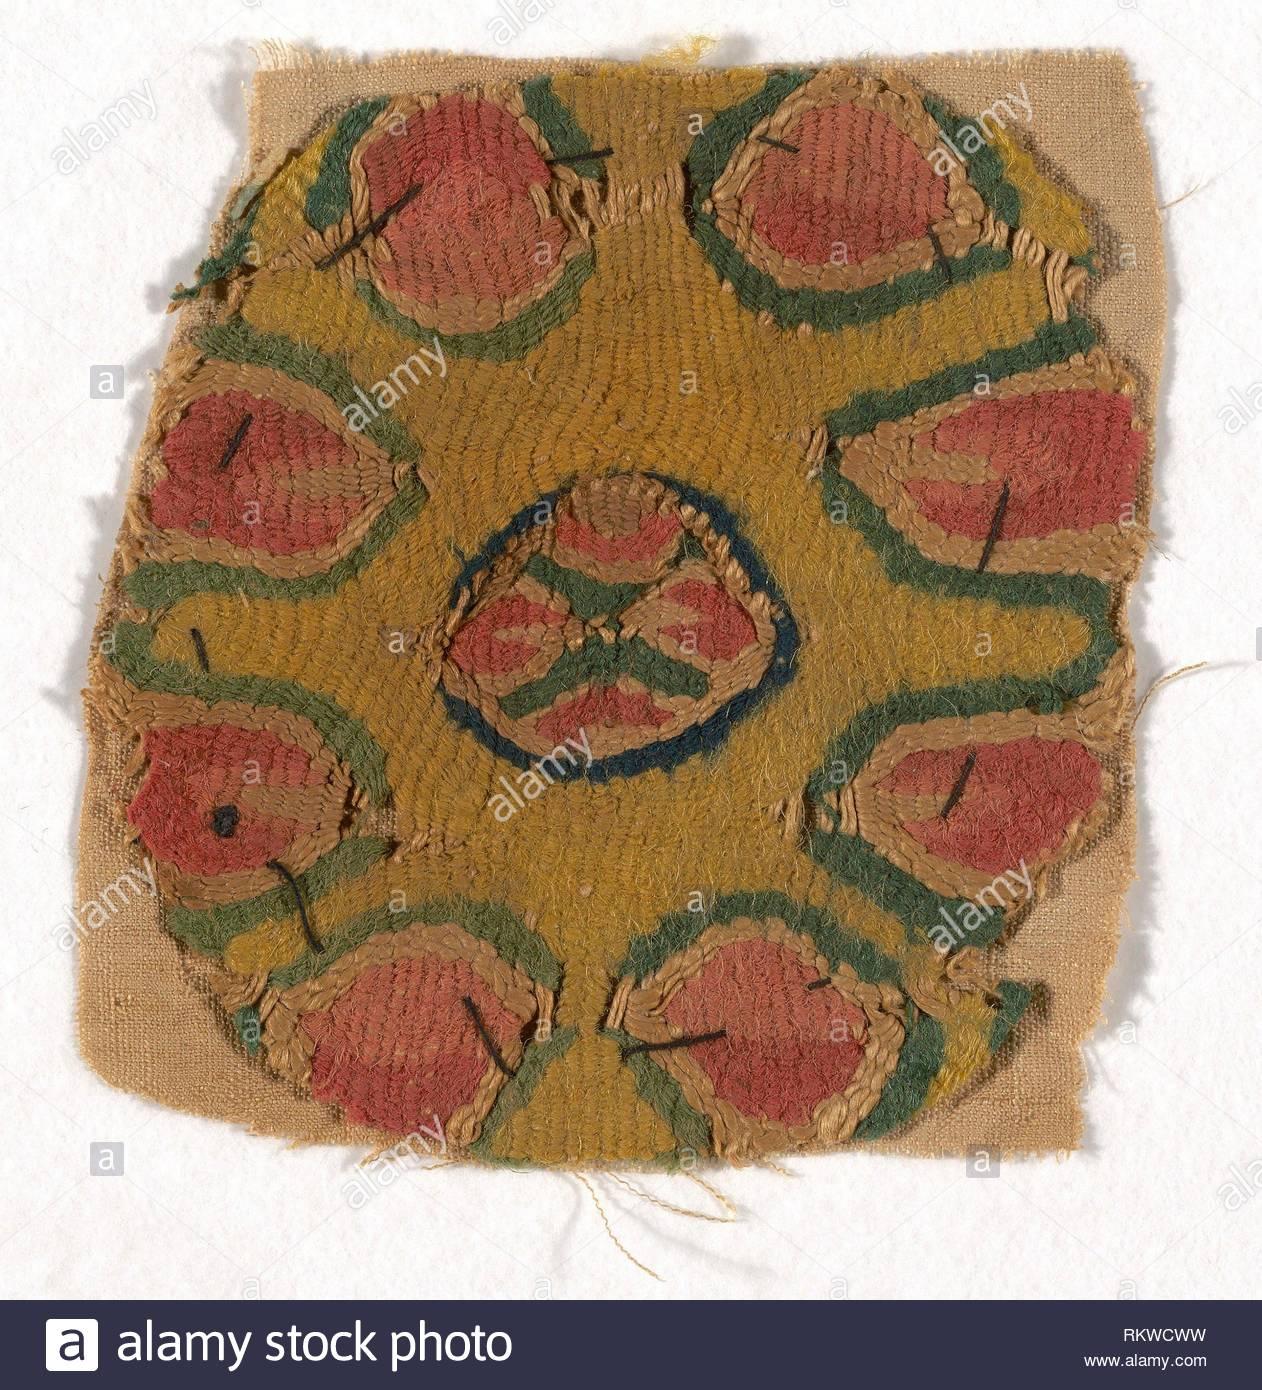 roundel roman period 30 bc 641 ad arab period 5th8th century coptic egypt artist coptic origin egypt date 401 ad800 RKWCWW